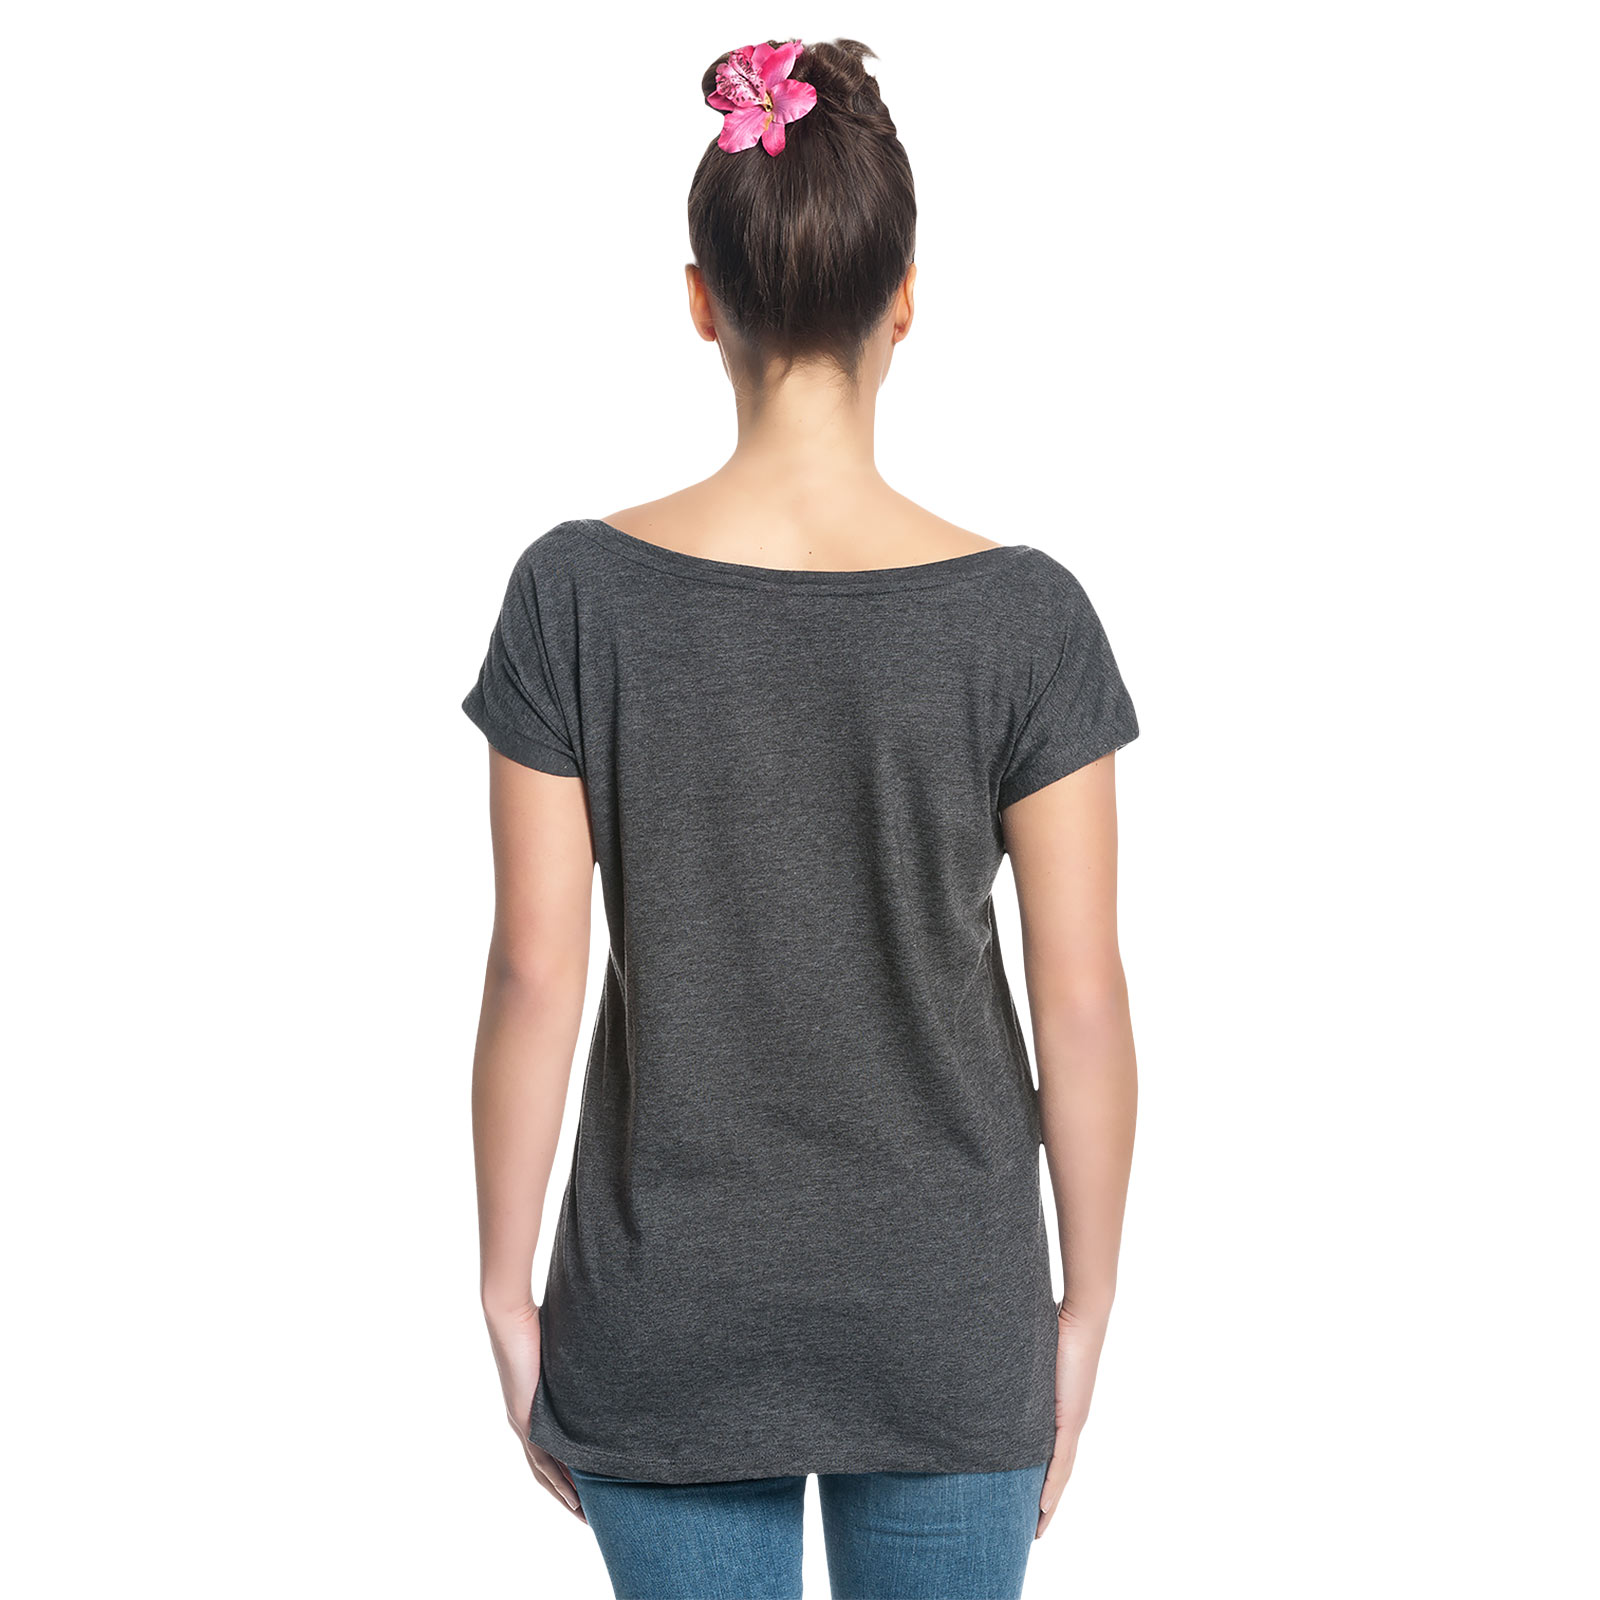 Alice im Wunderland - Wonderland T-Shirt Damen Loose Fit grau